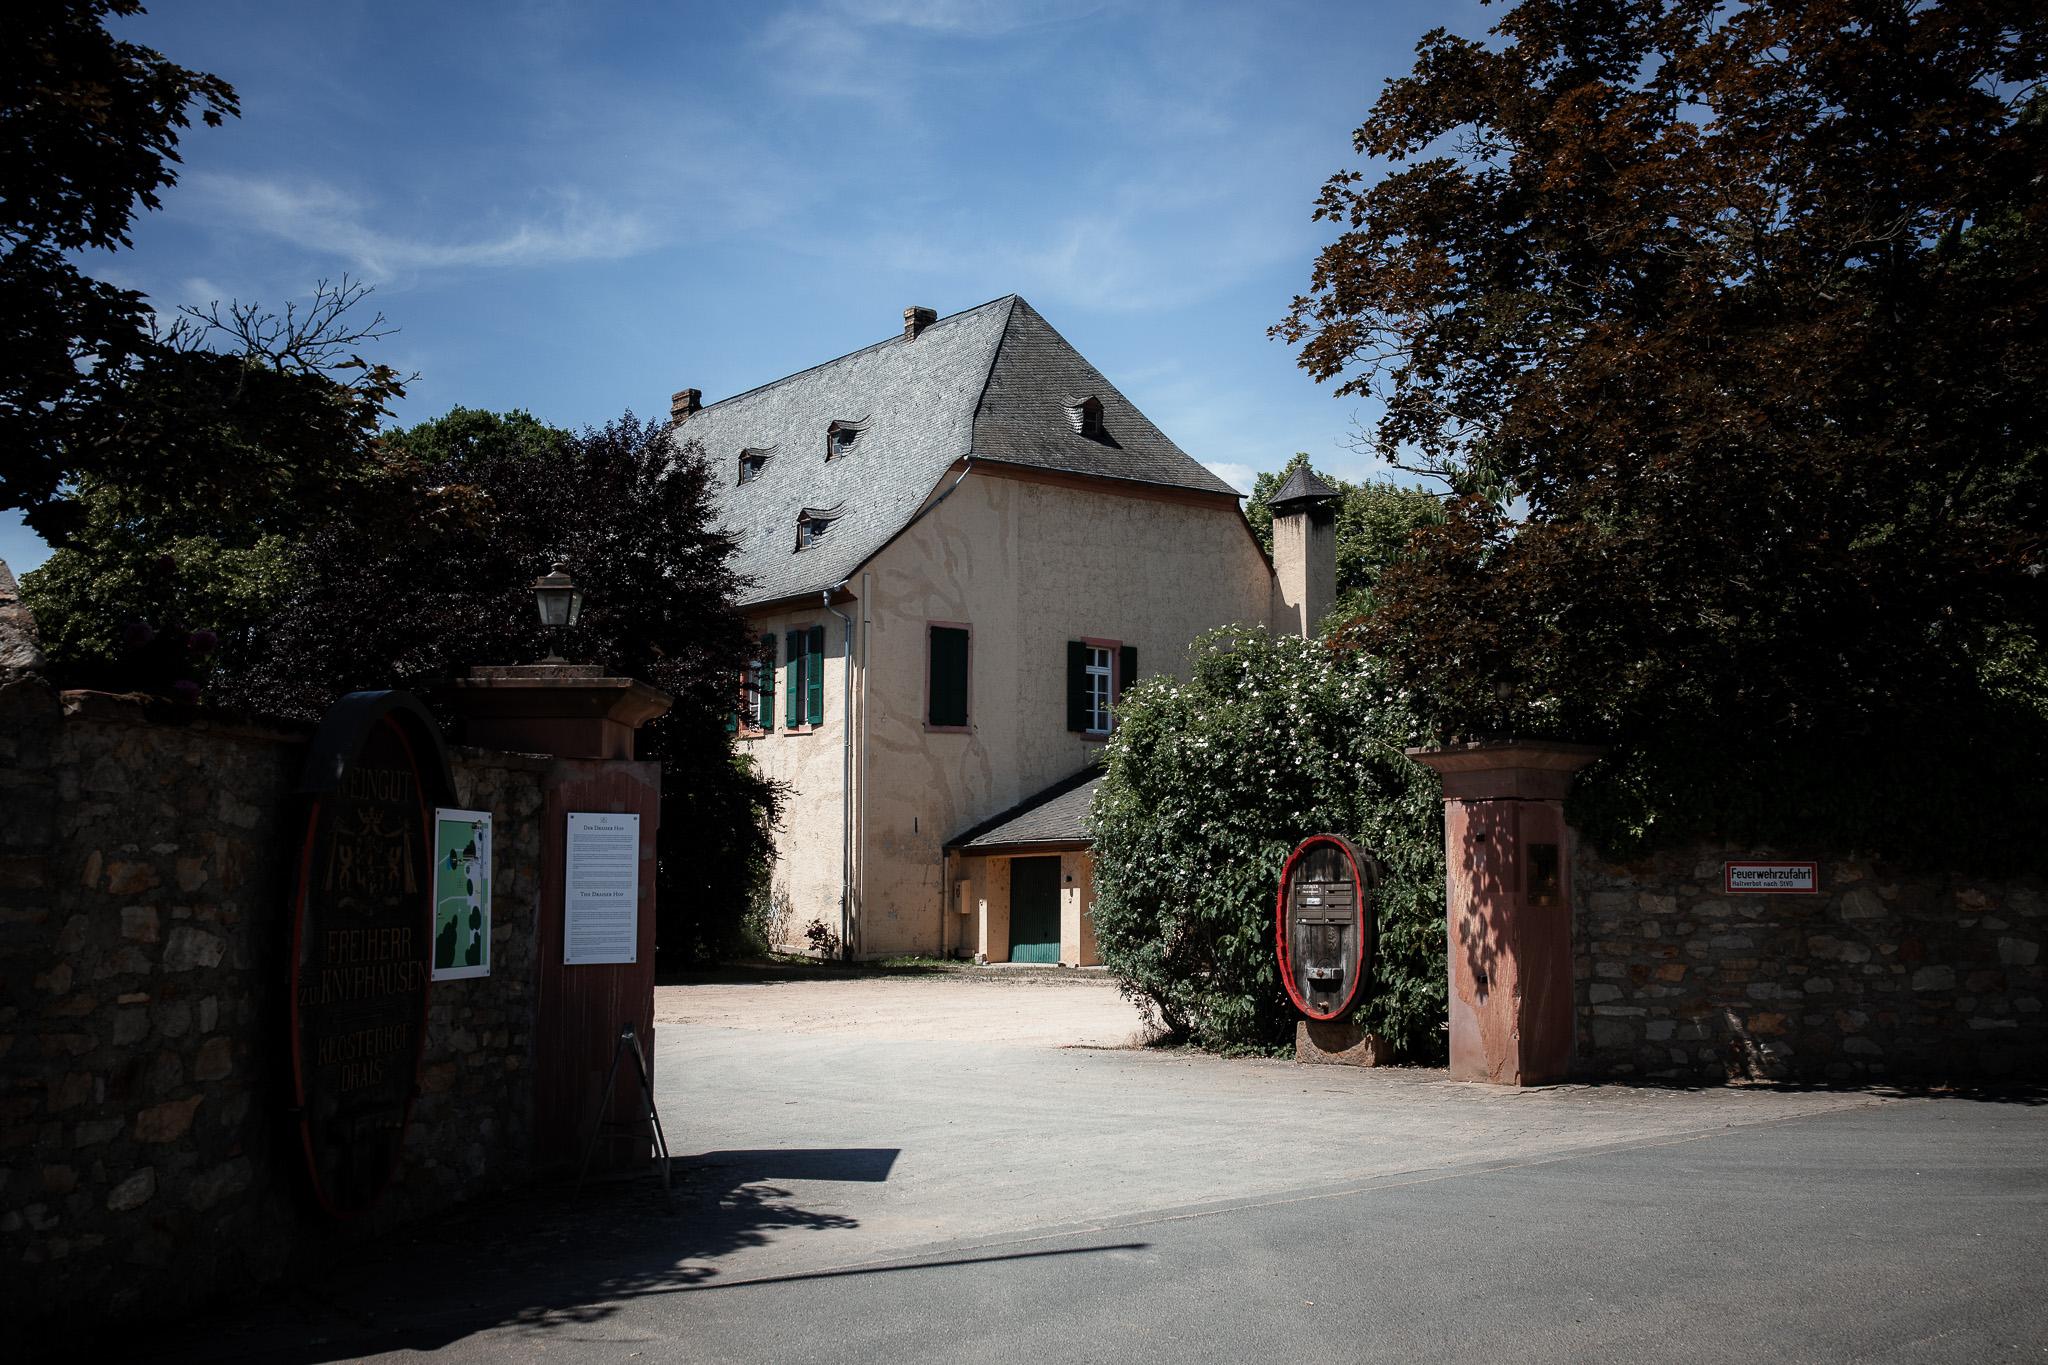 Weingut Baron Knyphausen Eltville